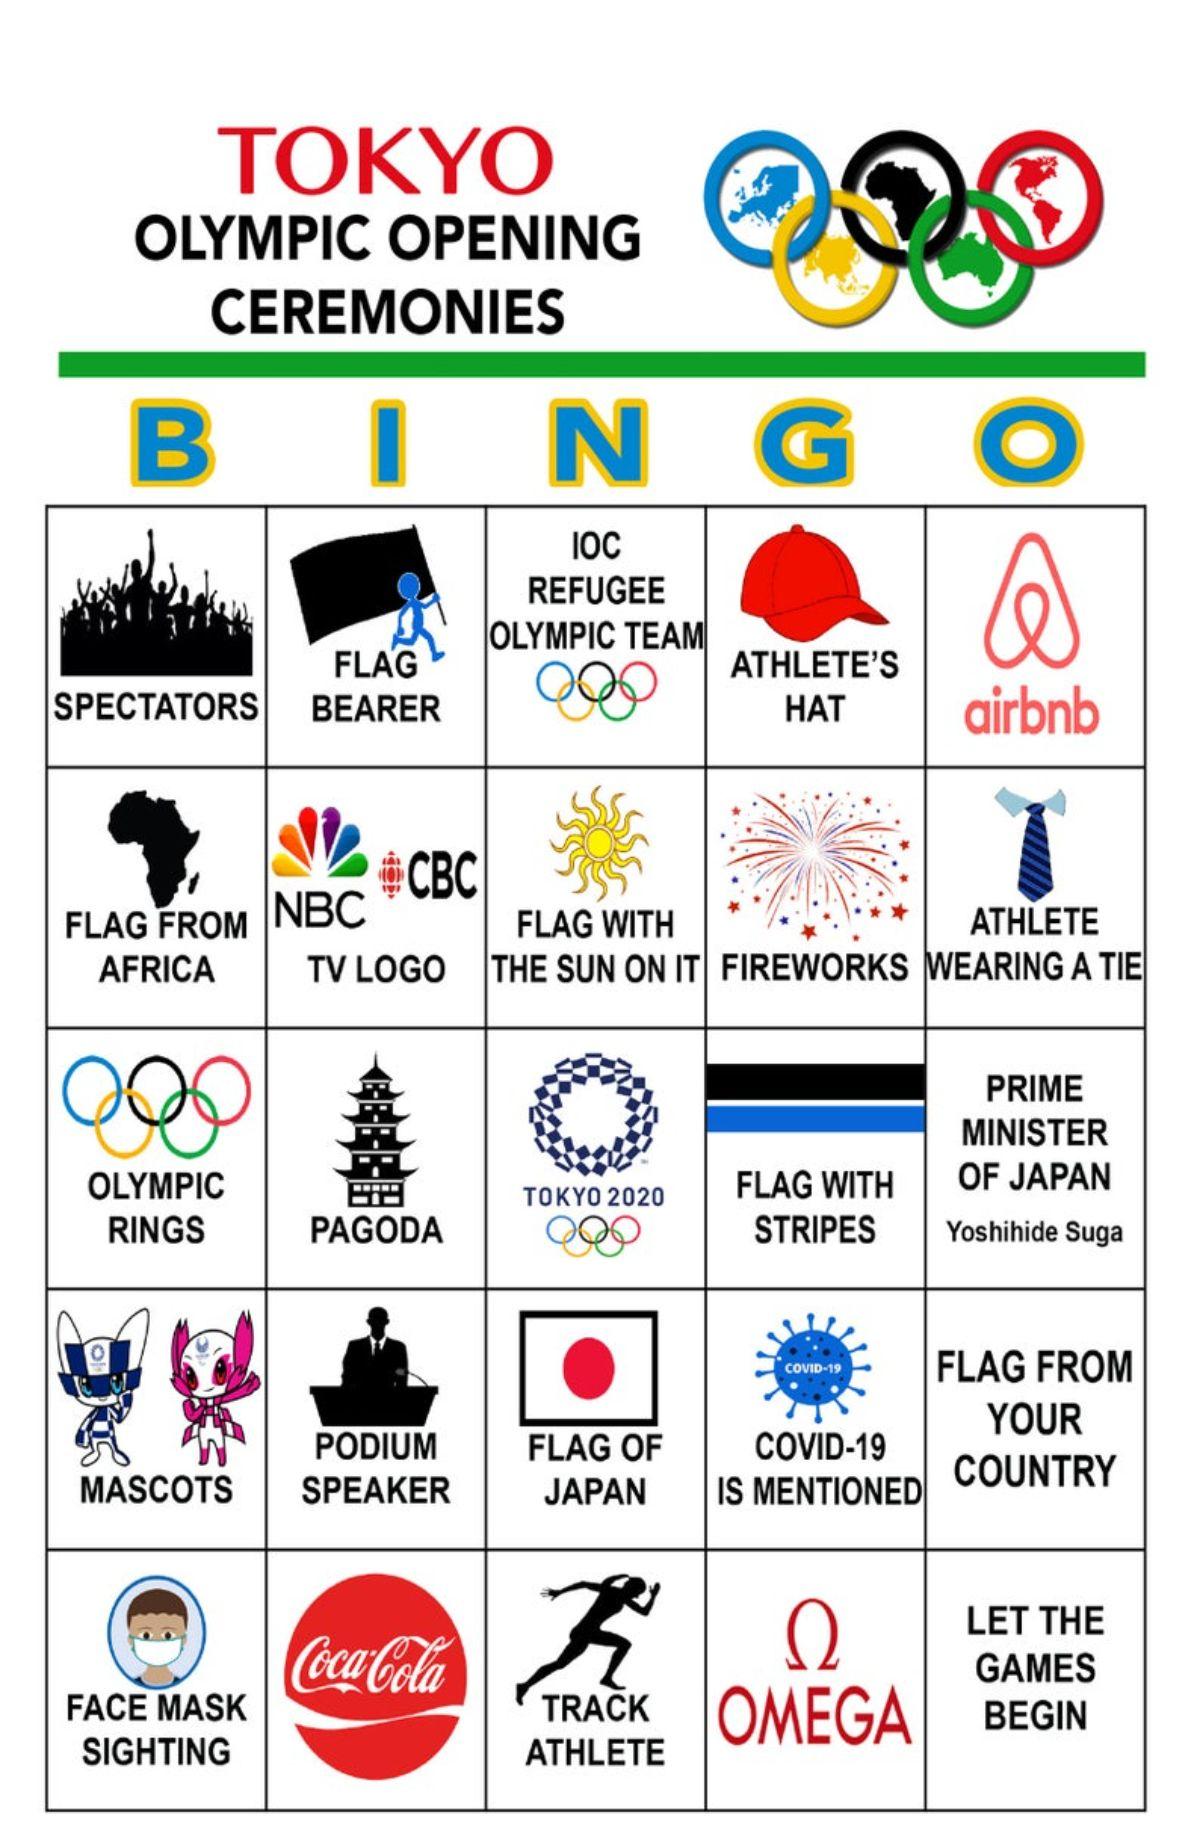 a screenshot of a bingo card around the TOkyo opening ceremony